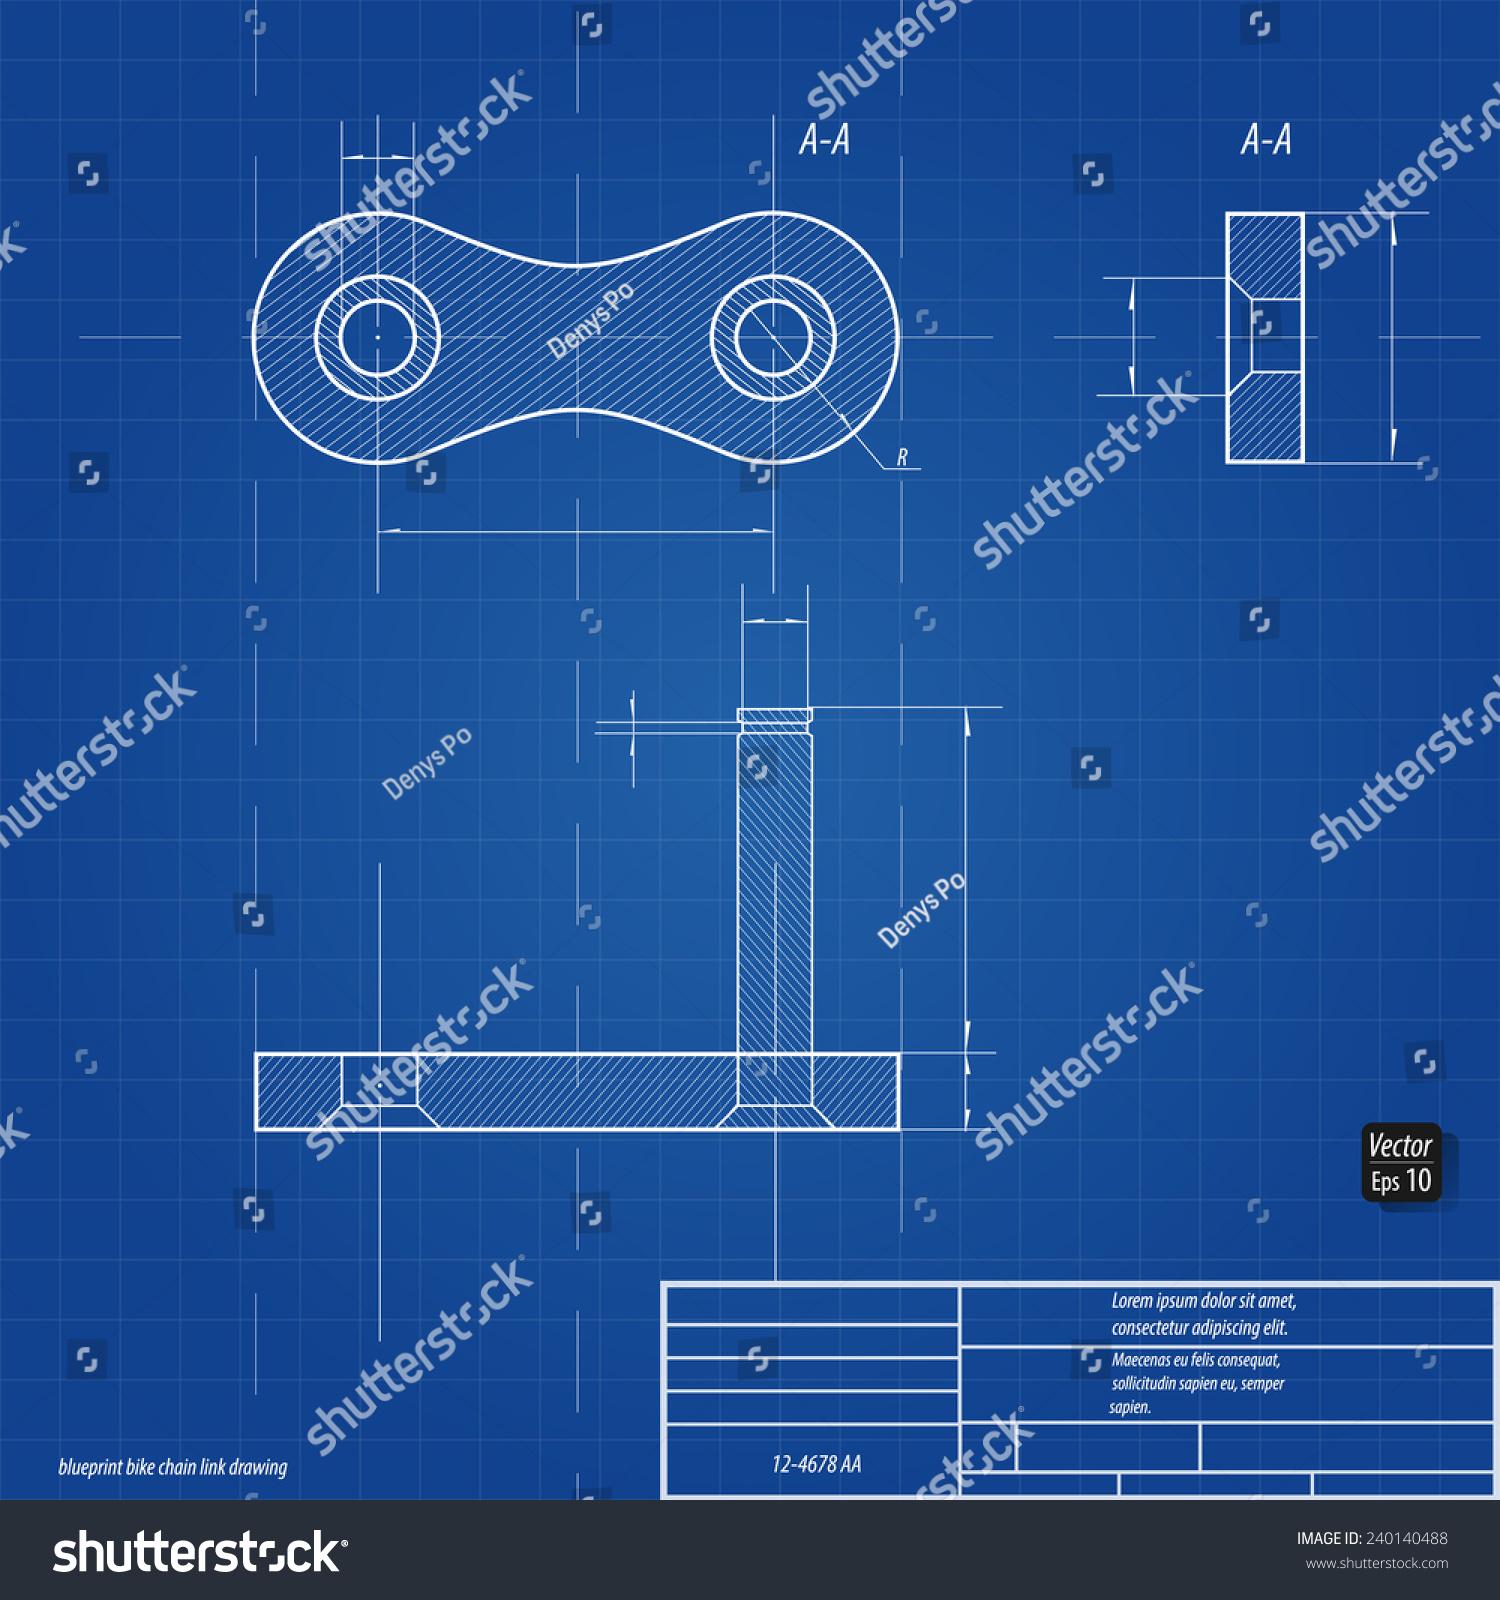 Blueprint Bike Chain Link Drawing Eps 10 Stock Vector